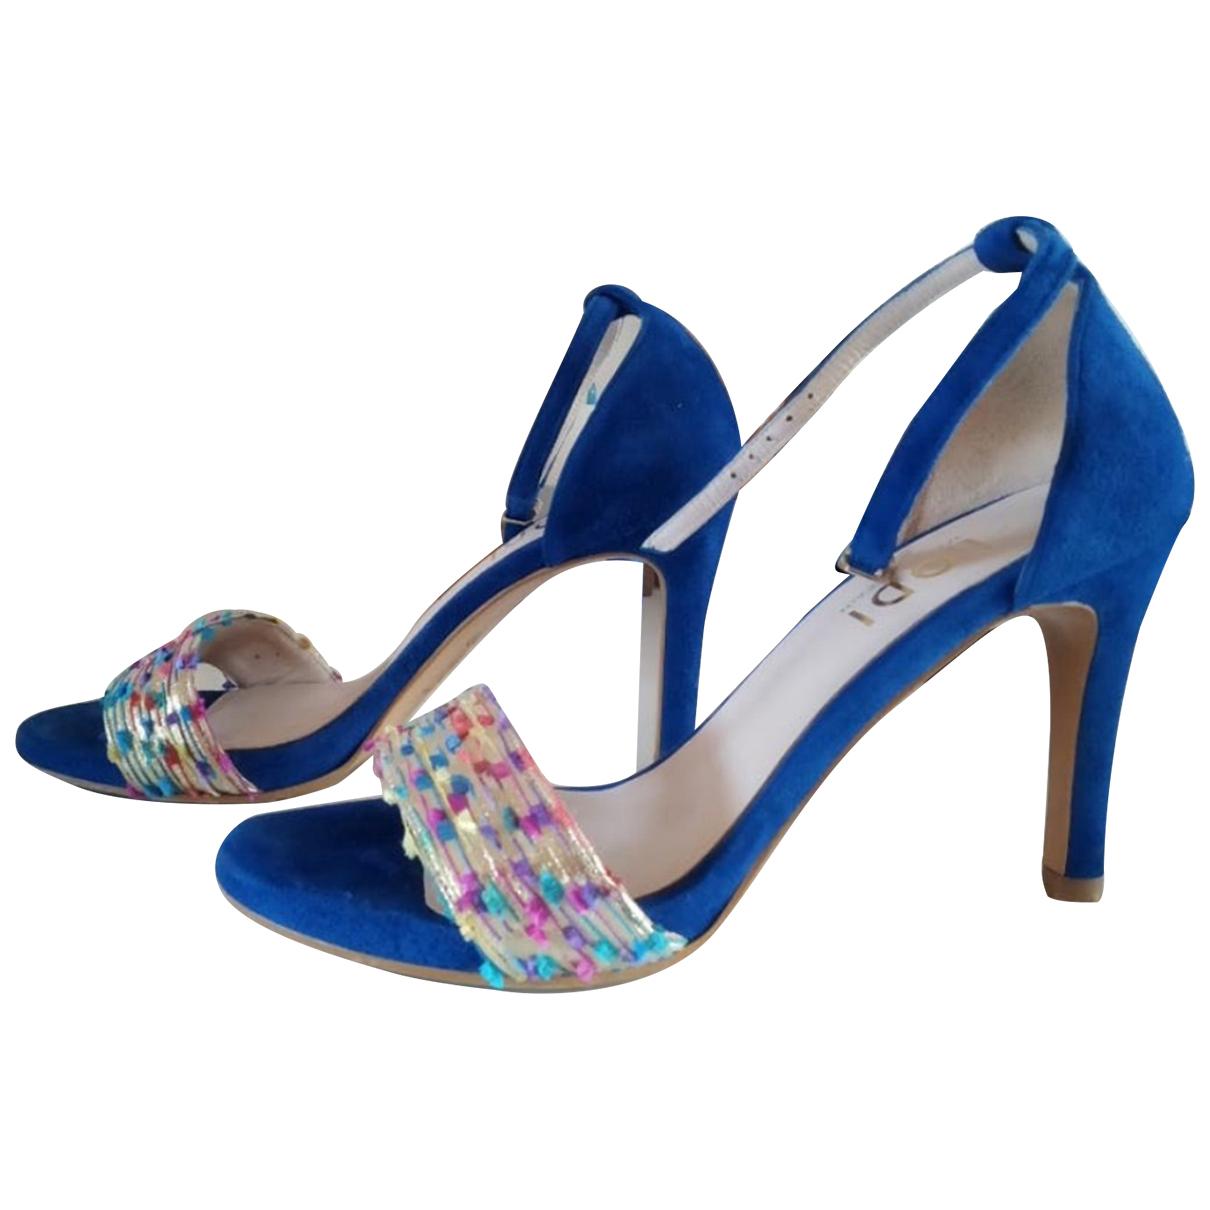 Non Signé / Unsigned N Blue Suede Sandals for Women 36 EU